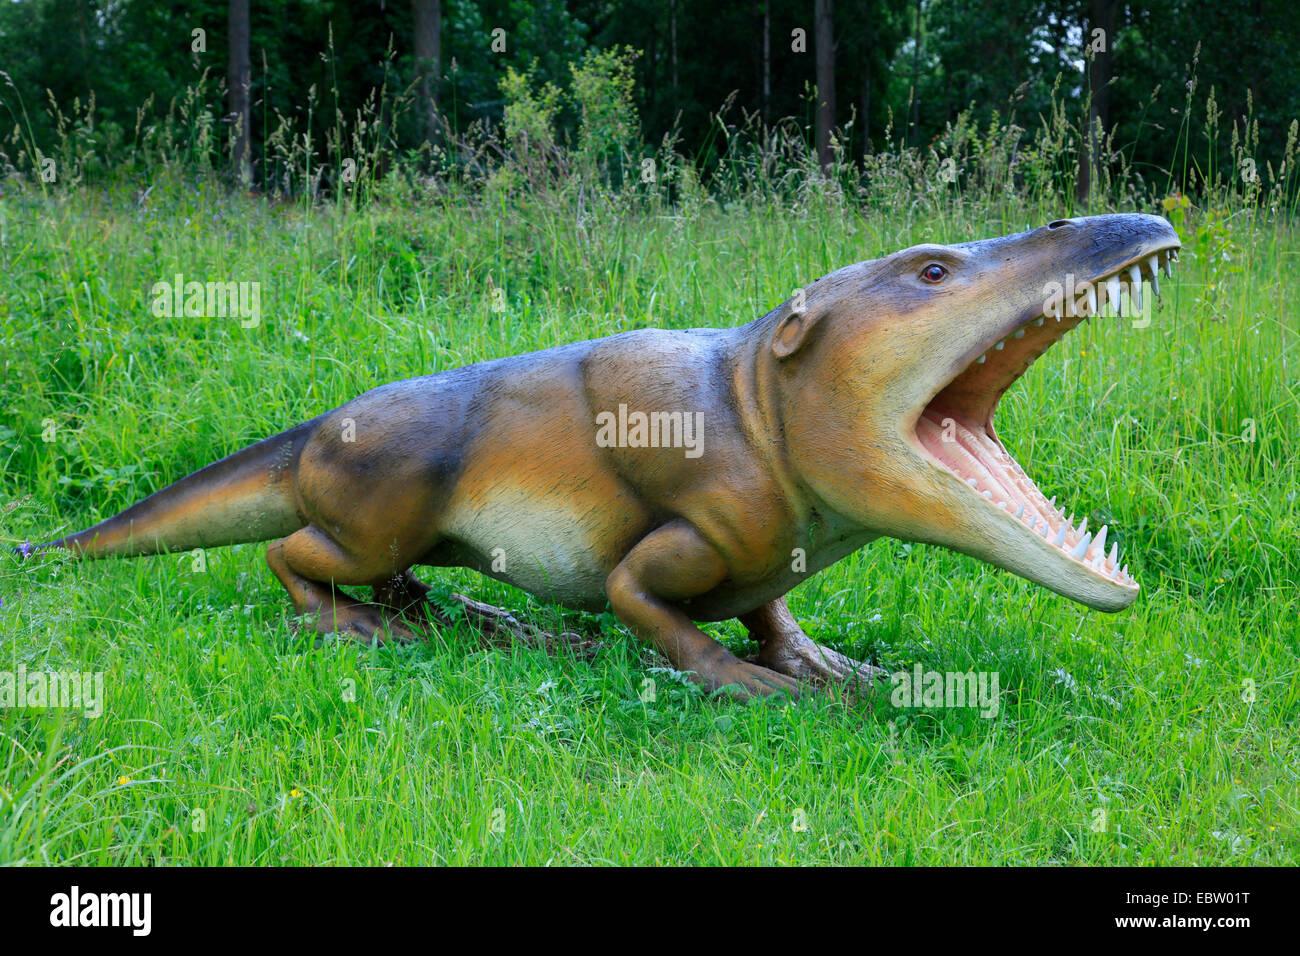 Ambulocetus (Ambulocetus natans), primitive extinct species of wales - Stock Image